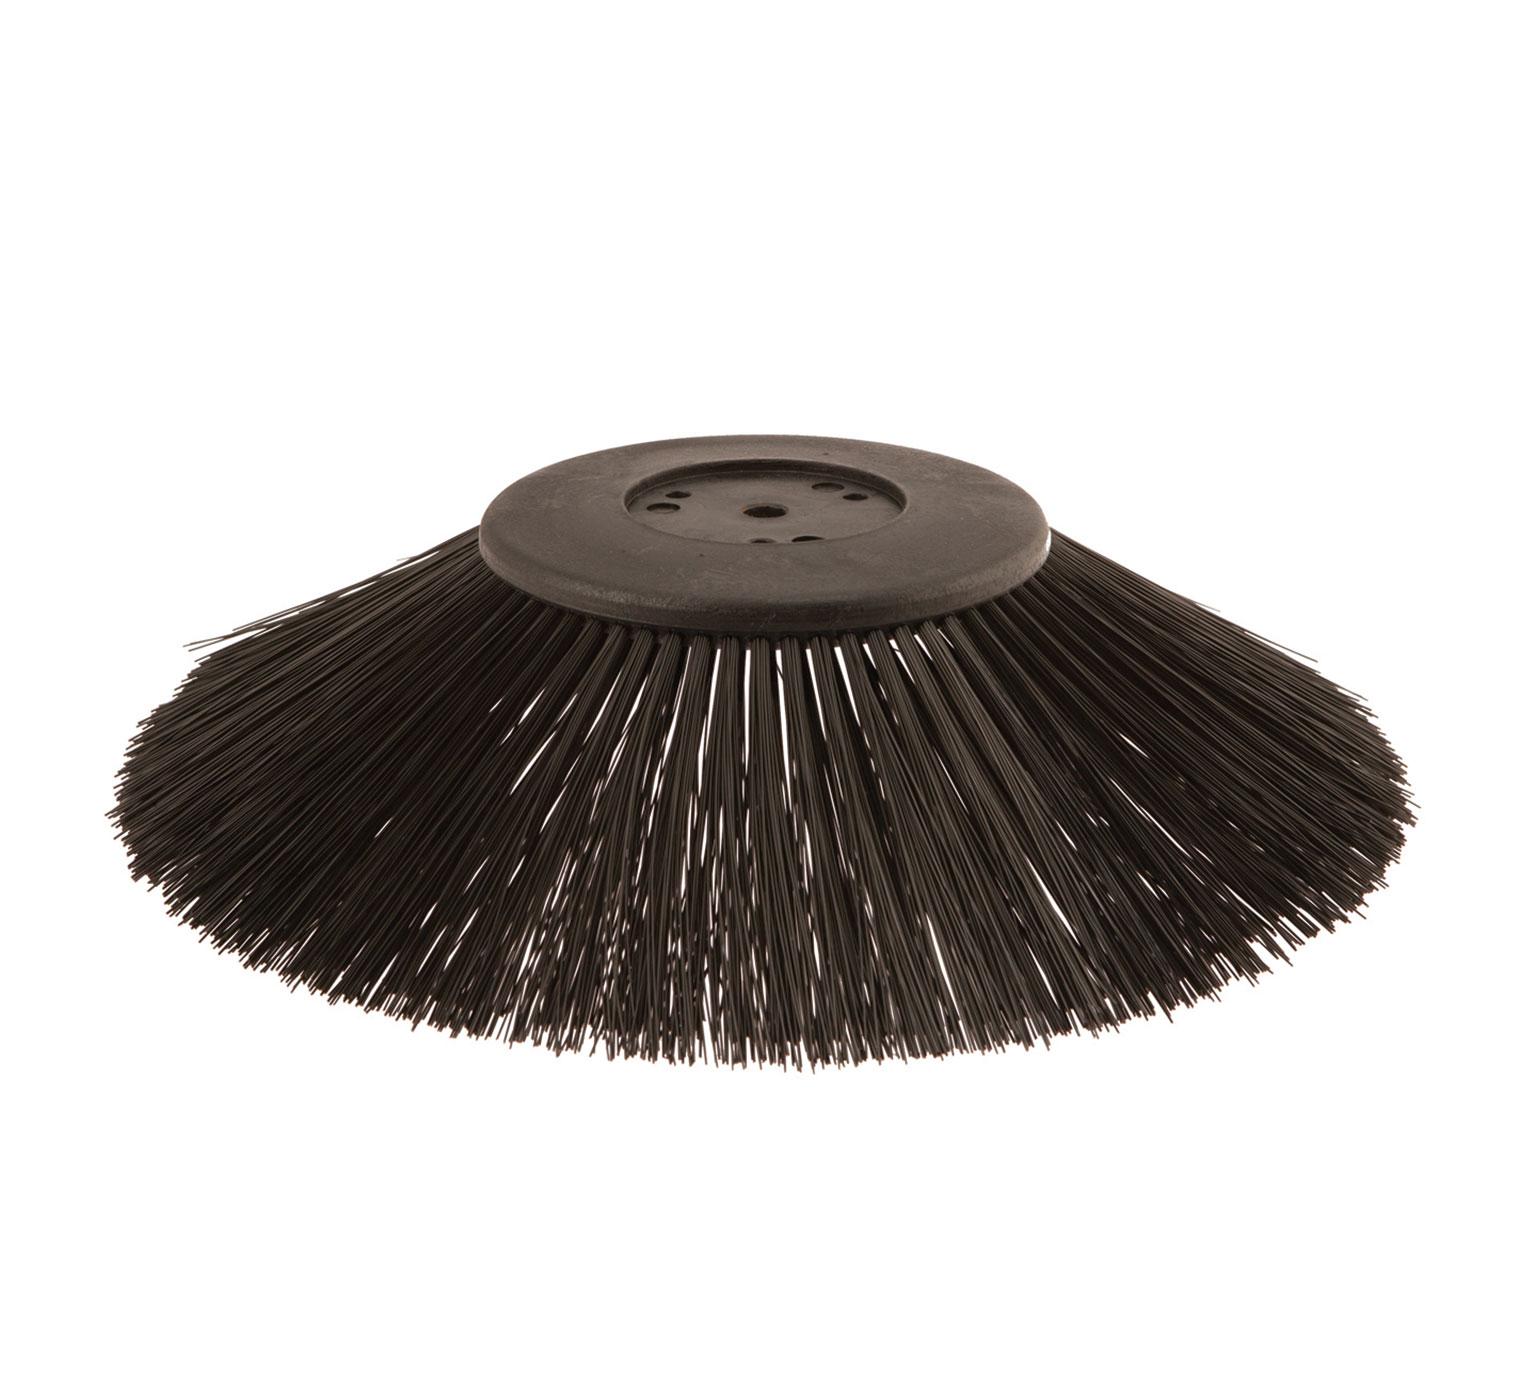 Tennanttrue Disk Sweep Side Brush Assembly Pn 603337